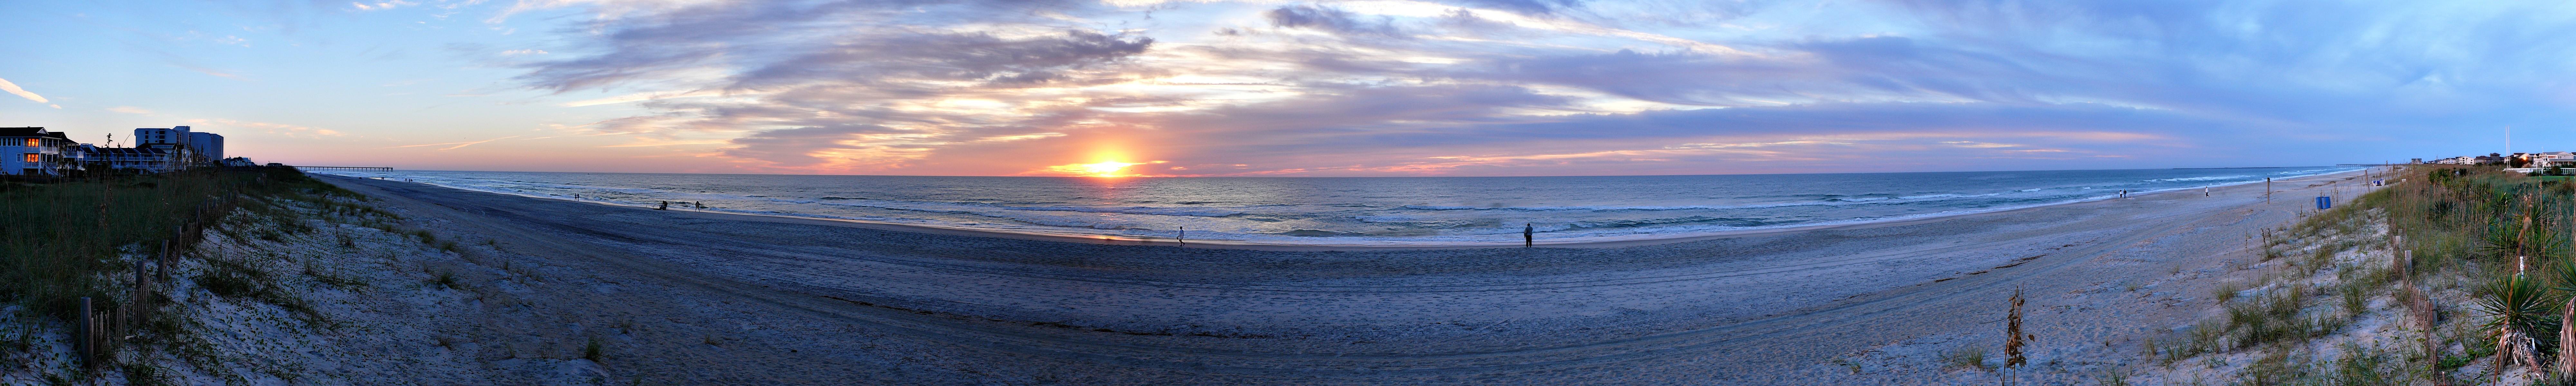 The Oceanic Wrightsville Beach Nc